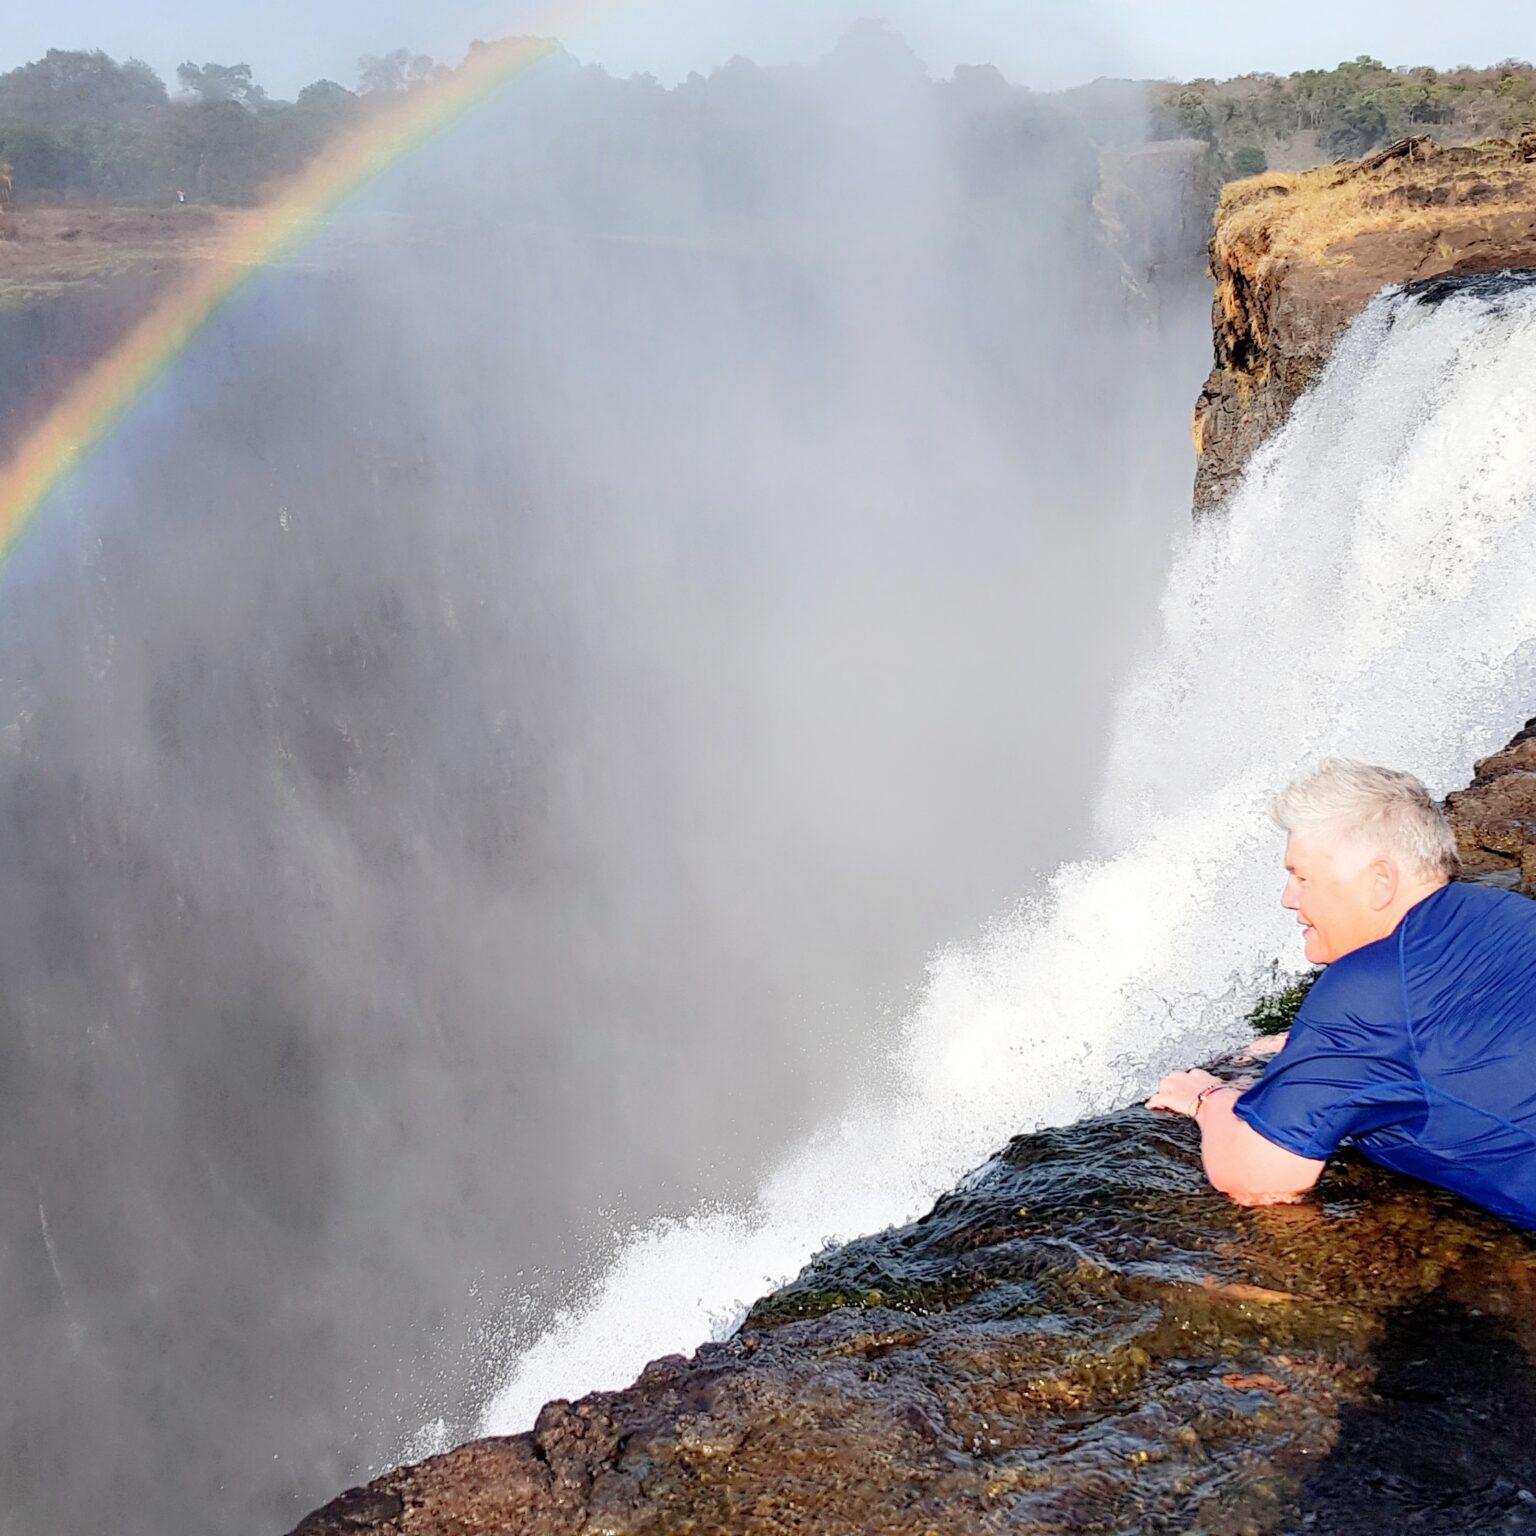 Peering over the edge of Victoria Falls